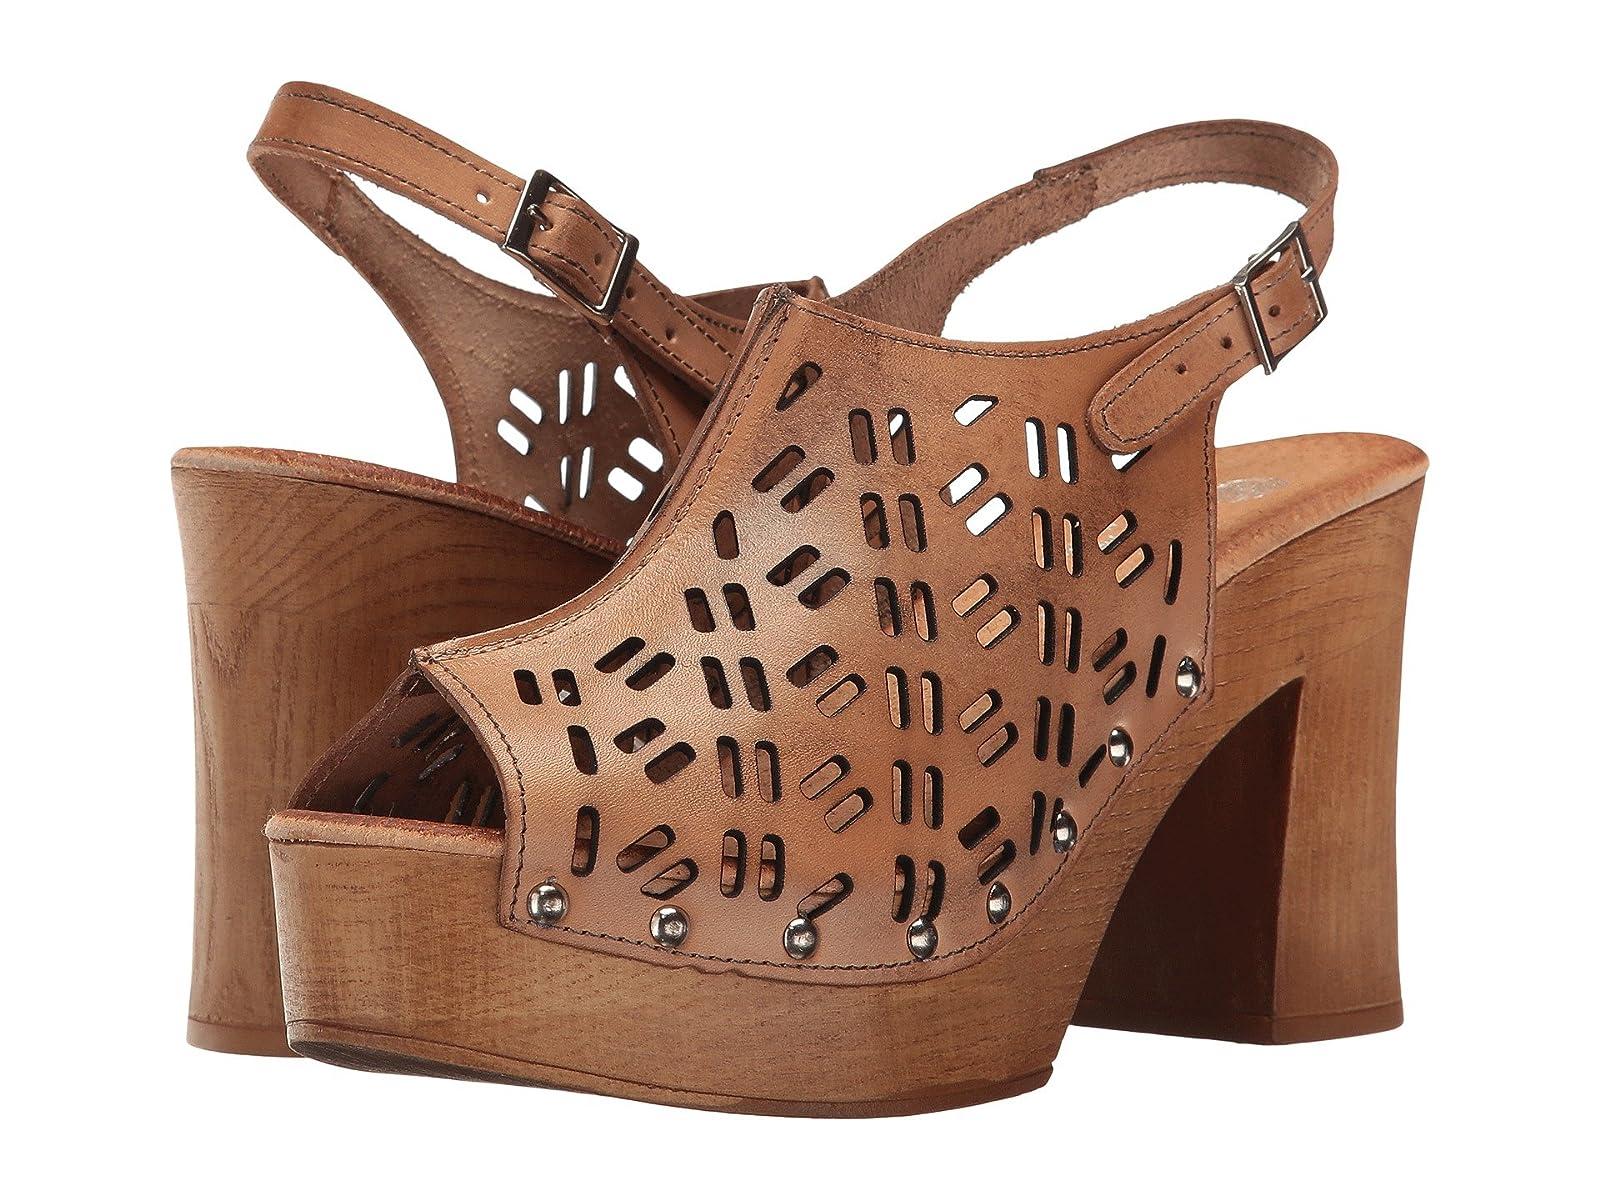 Eric Michael CharlieCheap and distinctive eye-catching shoes